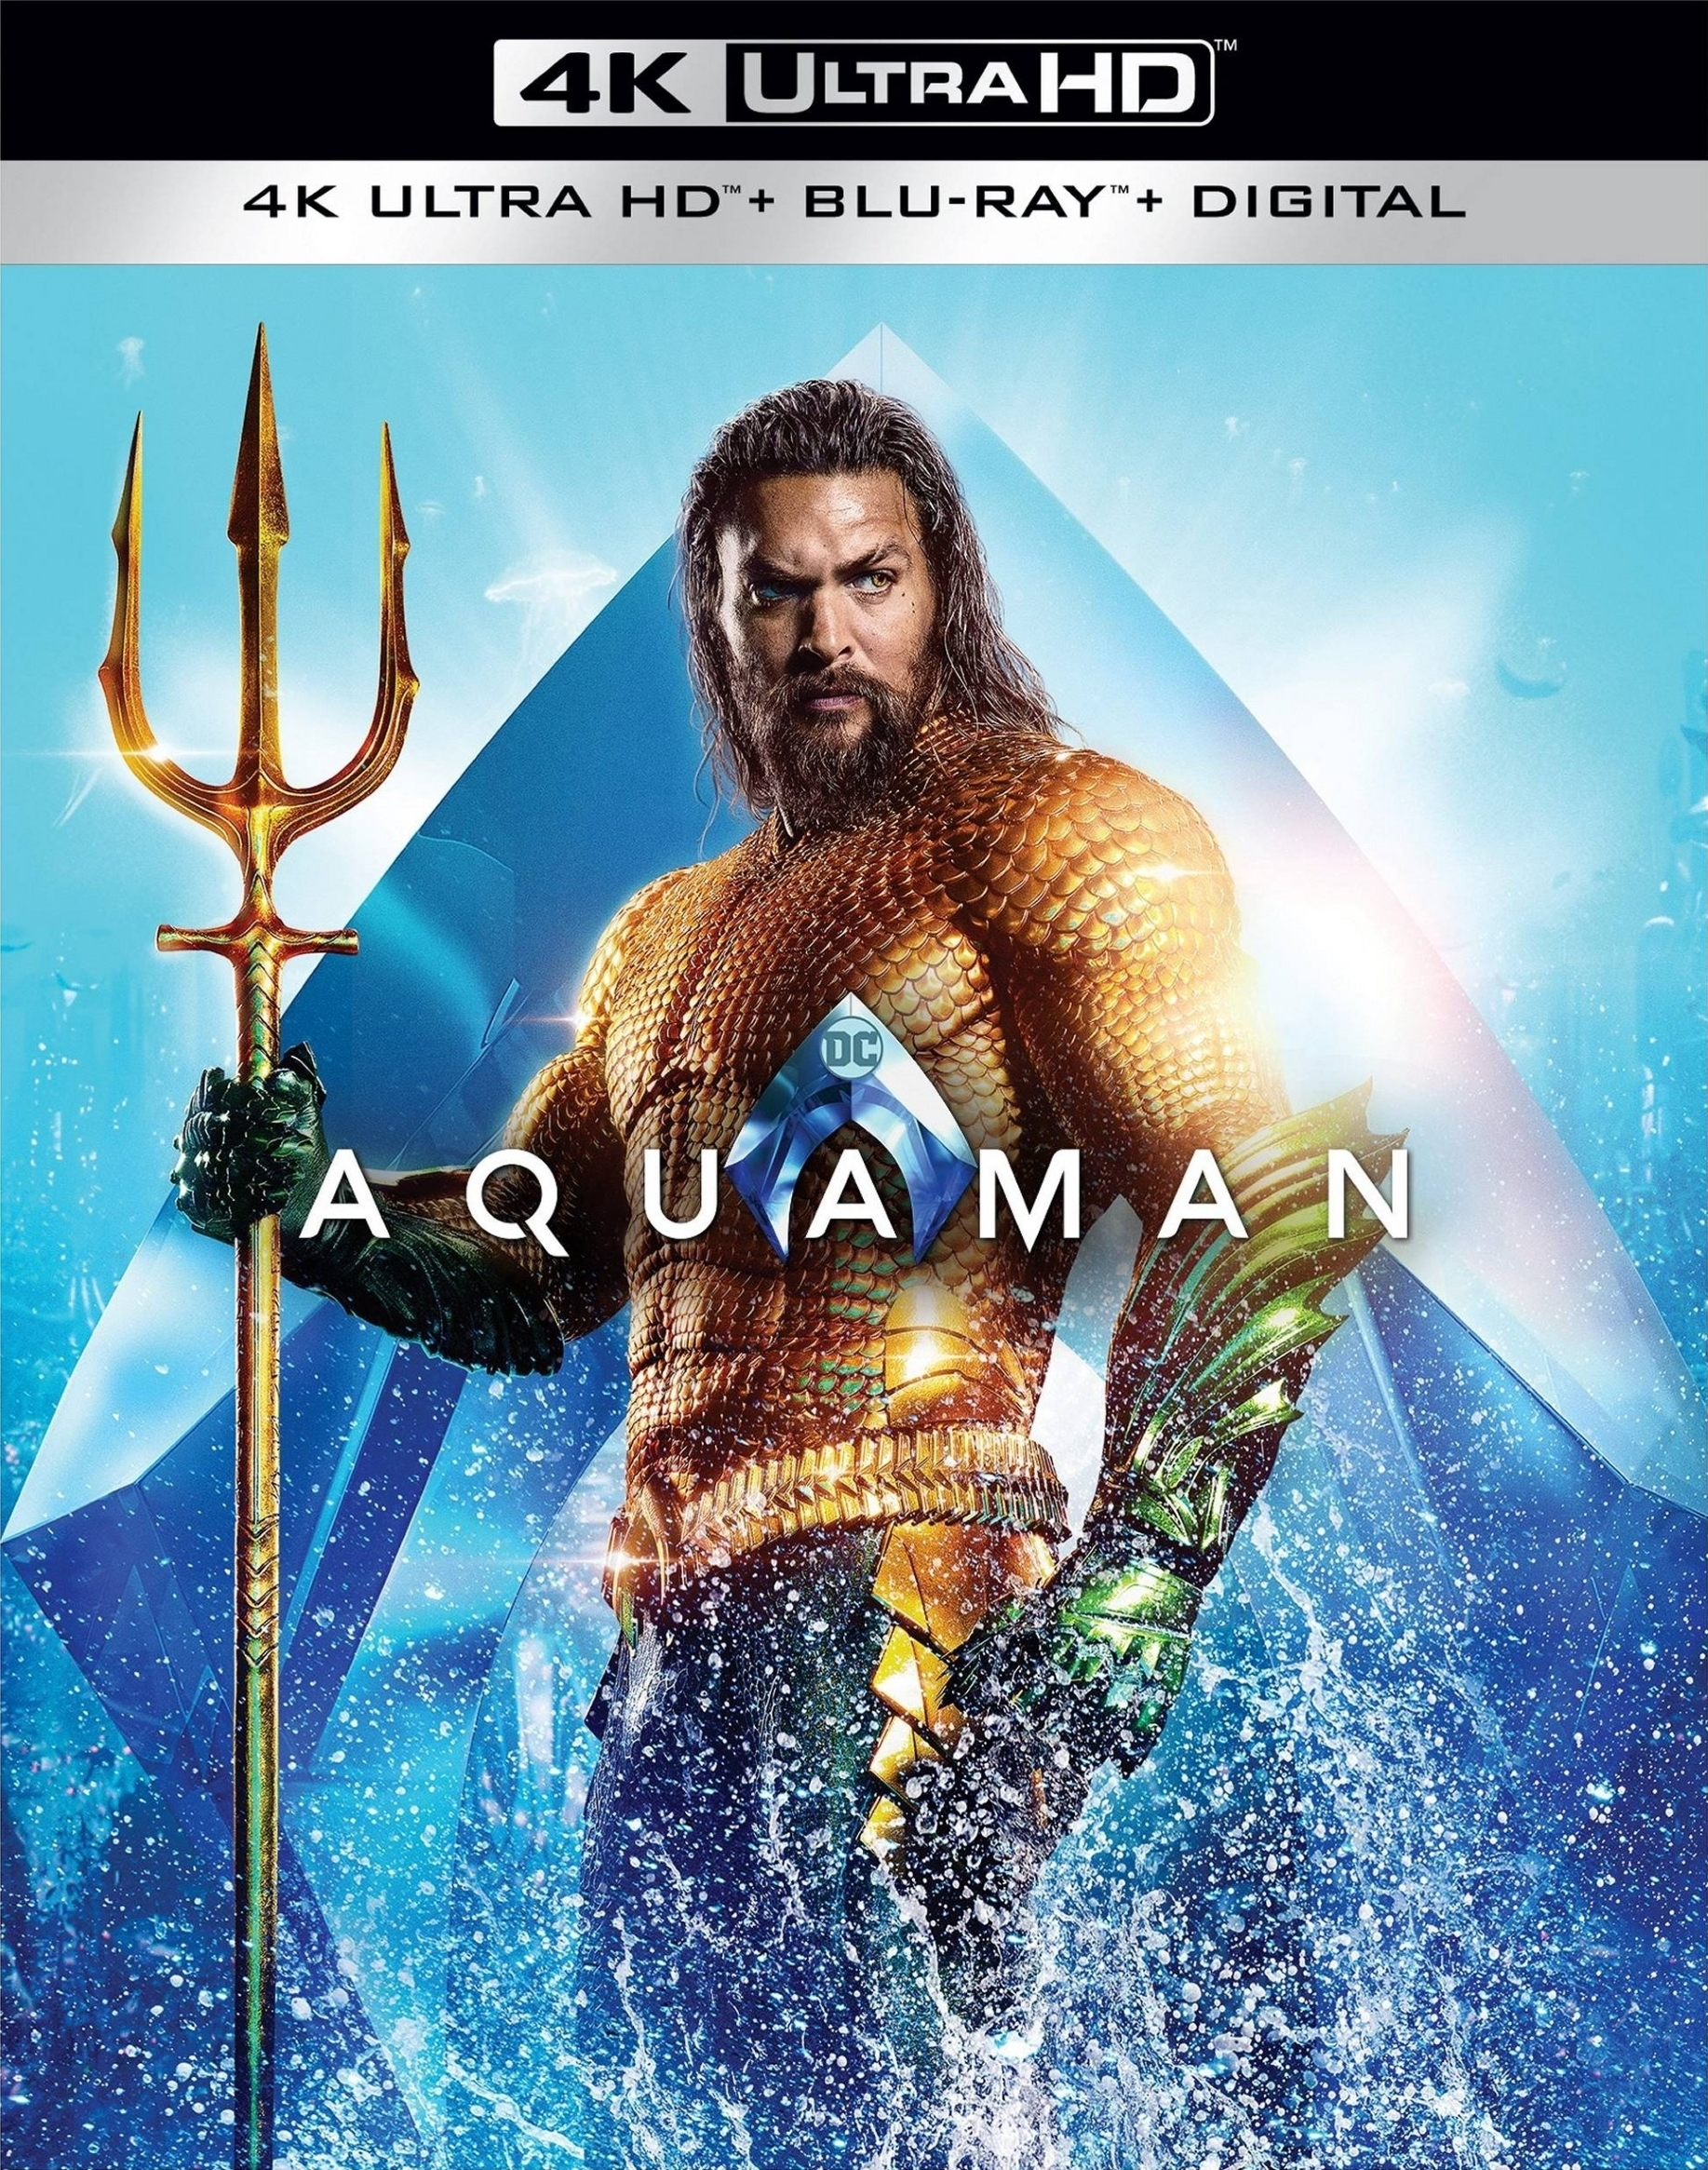 Download Aquaman (2018) IMAX 2160p HDR 10bit BluRay x265 HEVC [Org